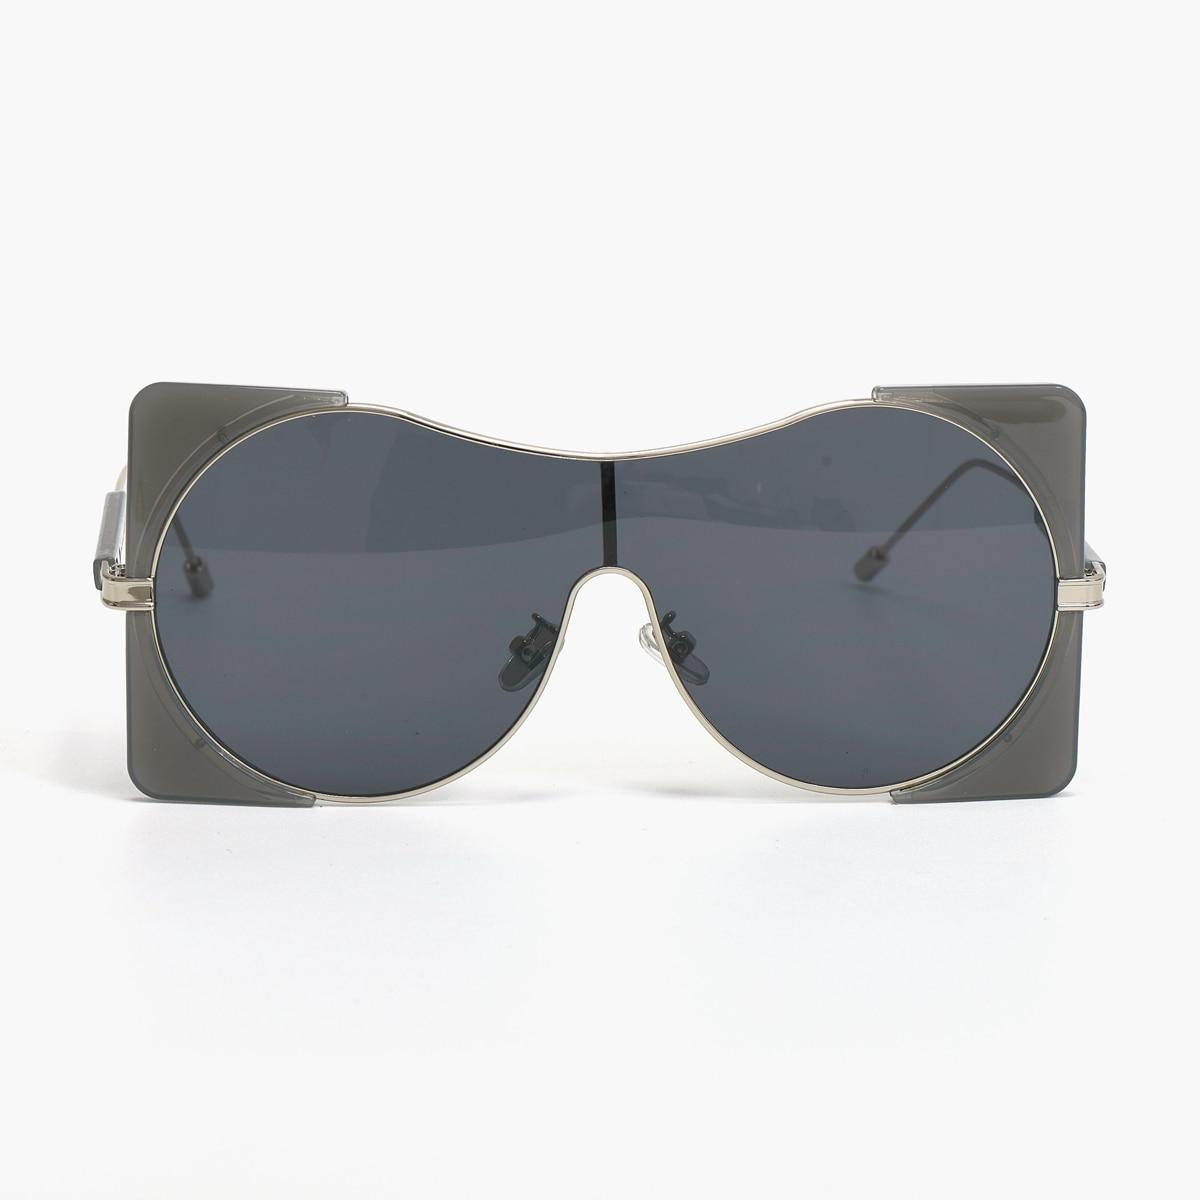 47040 Oversized Vierkante Zonnebril Vrouwen Mode UV400 Vintage Bril